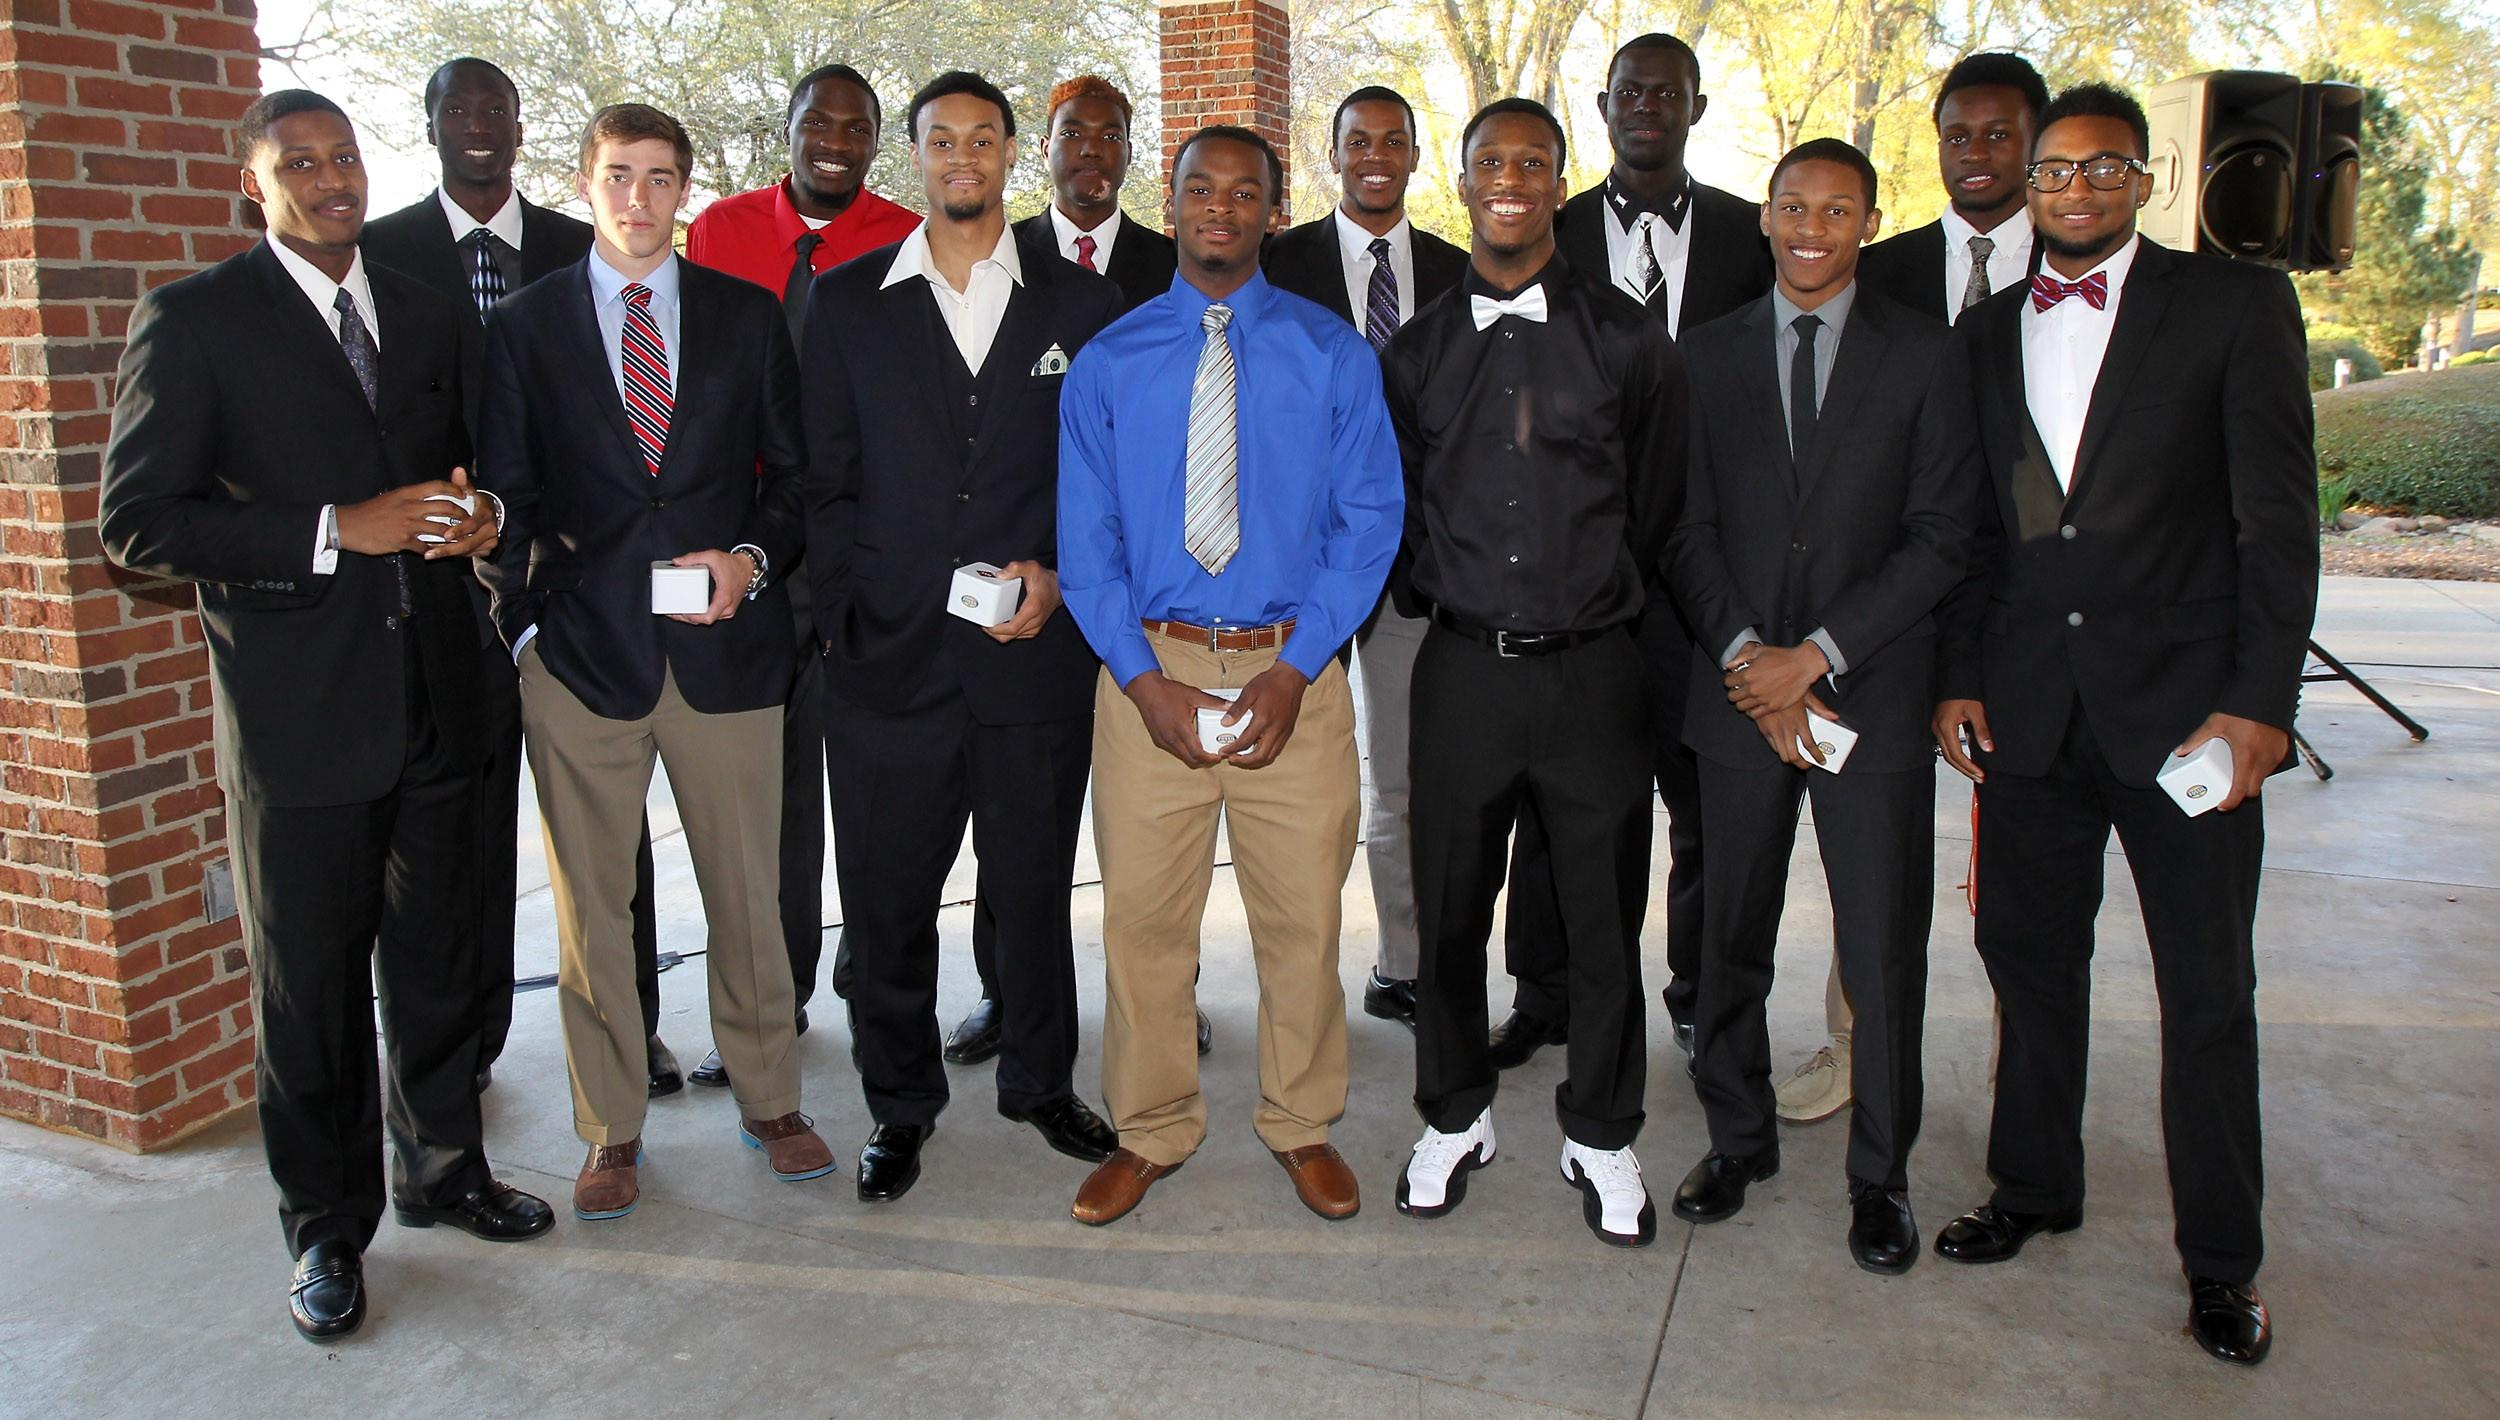 Men's Basketball Holds 2013-14 Awards Banquet